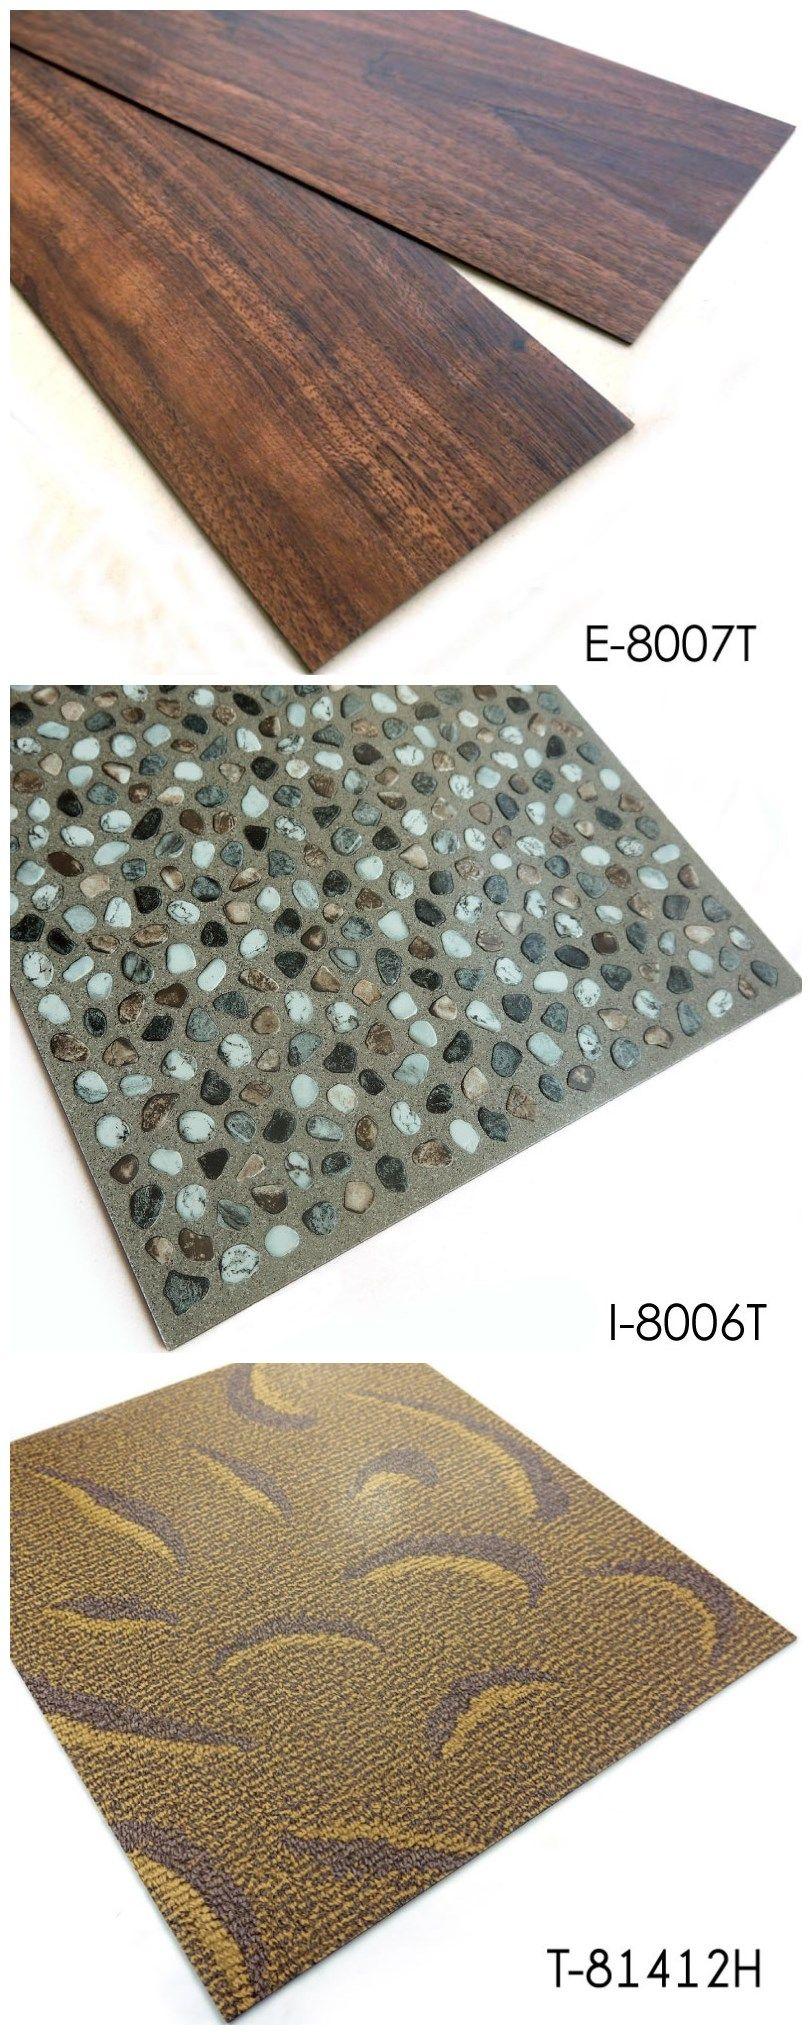 High Quality And Waterproof Pvc Flooring Pvc Flooring Vinyl Flooring Vinyl Sheet Flooring